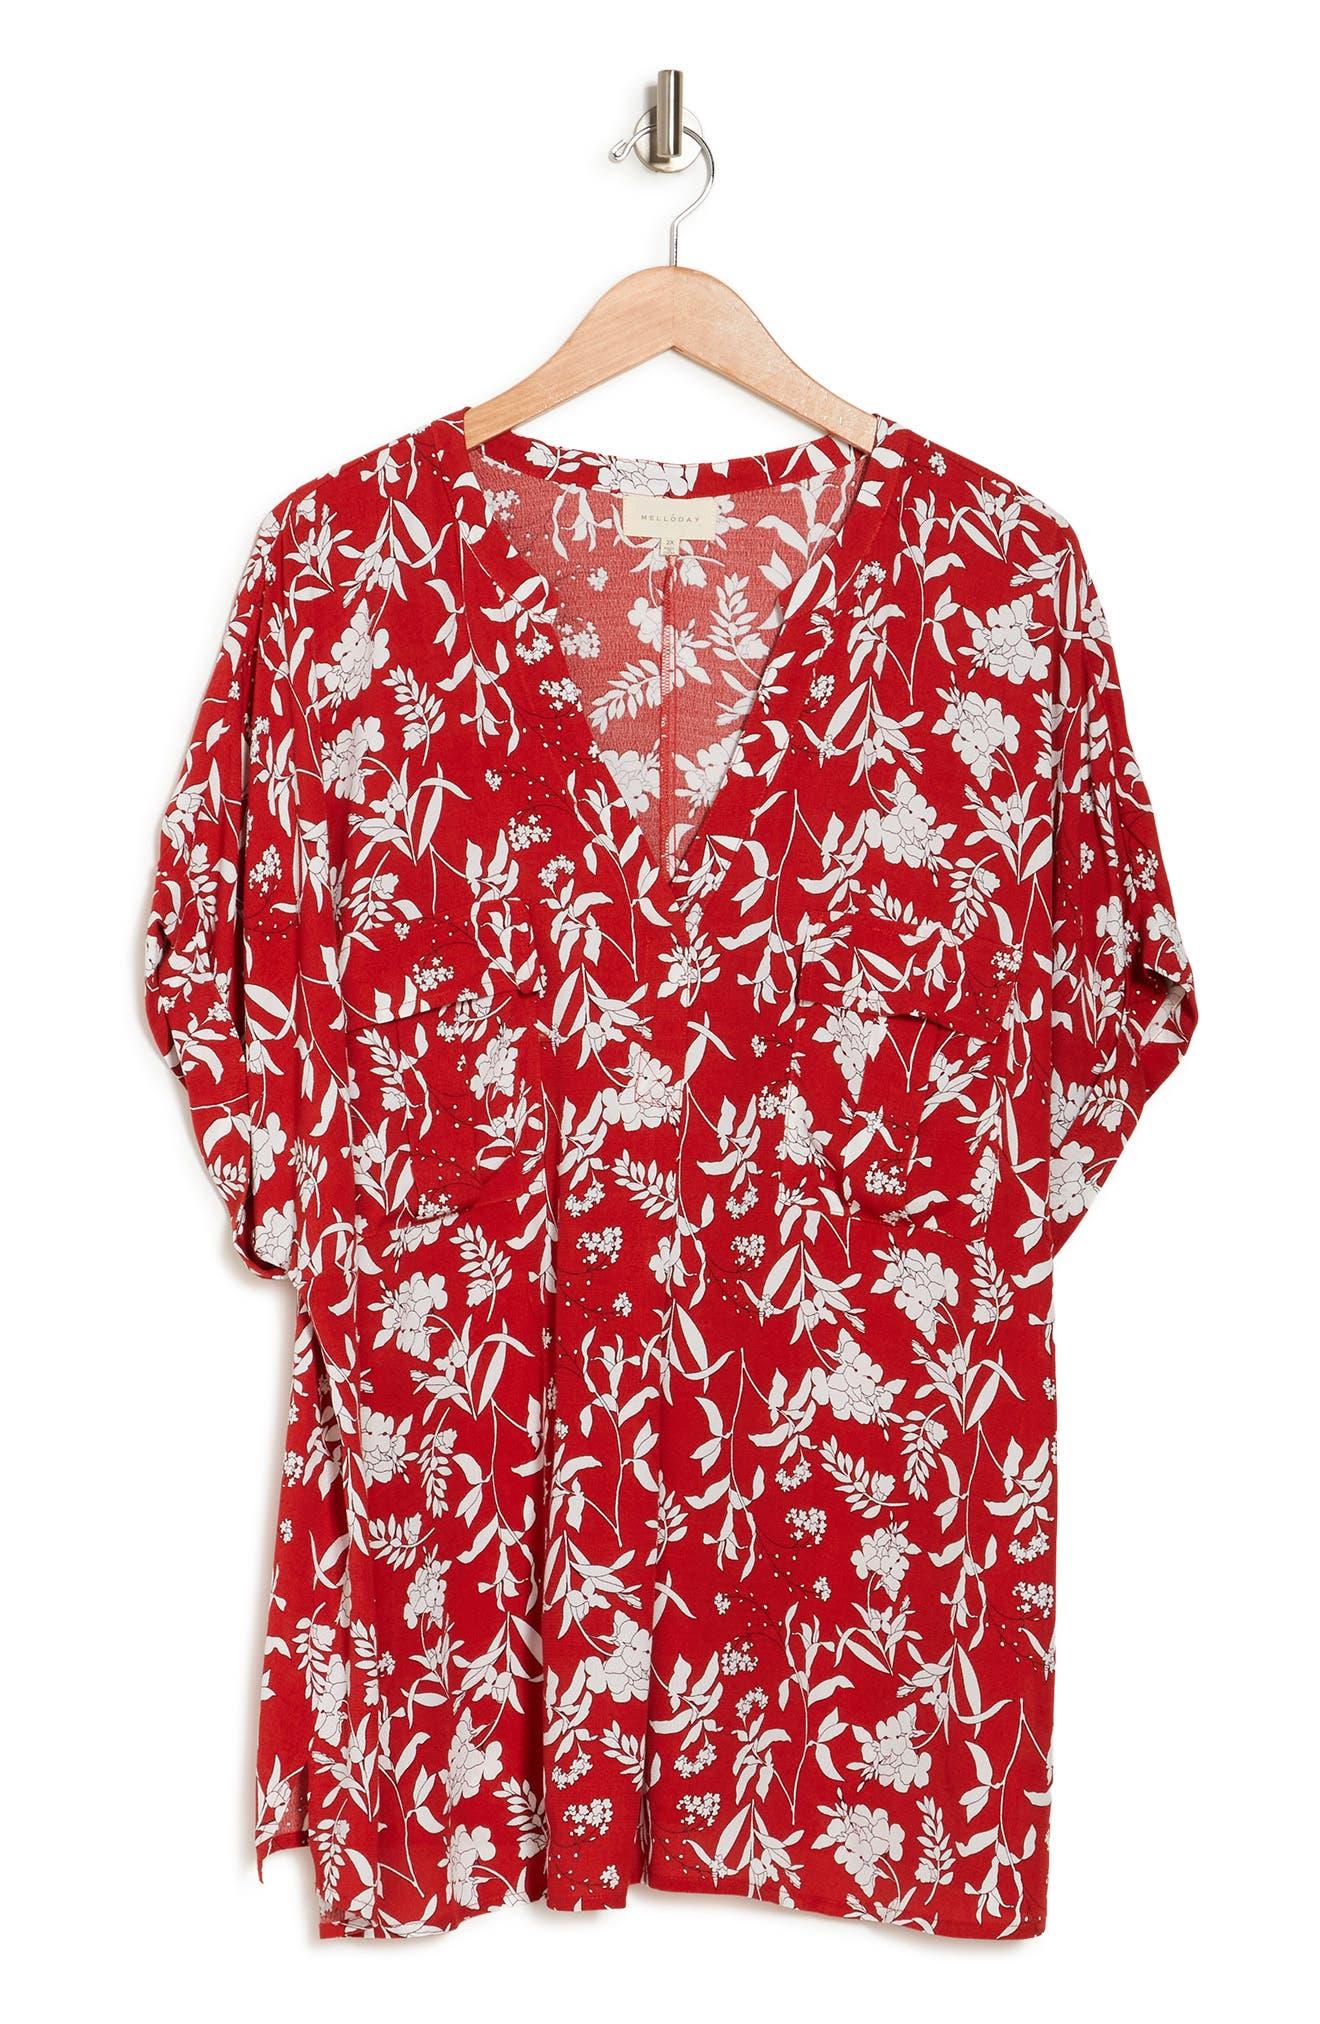 Melloday Utility Shirt In Red/white Print